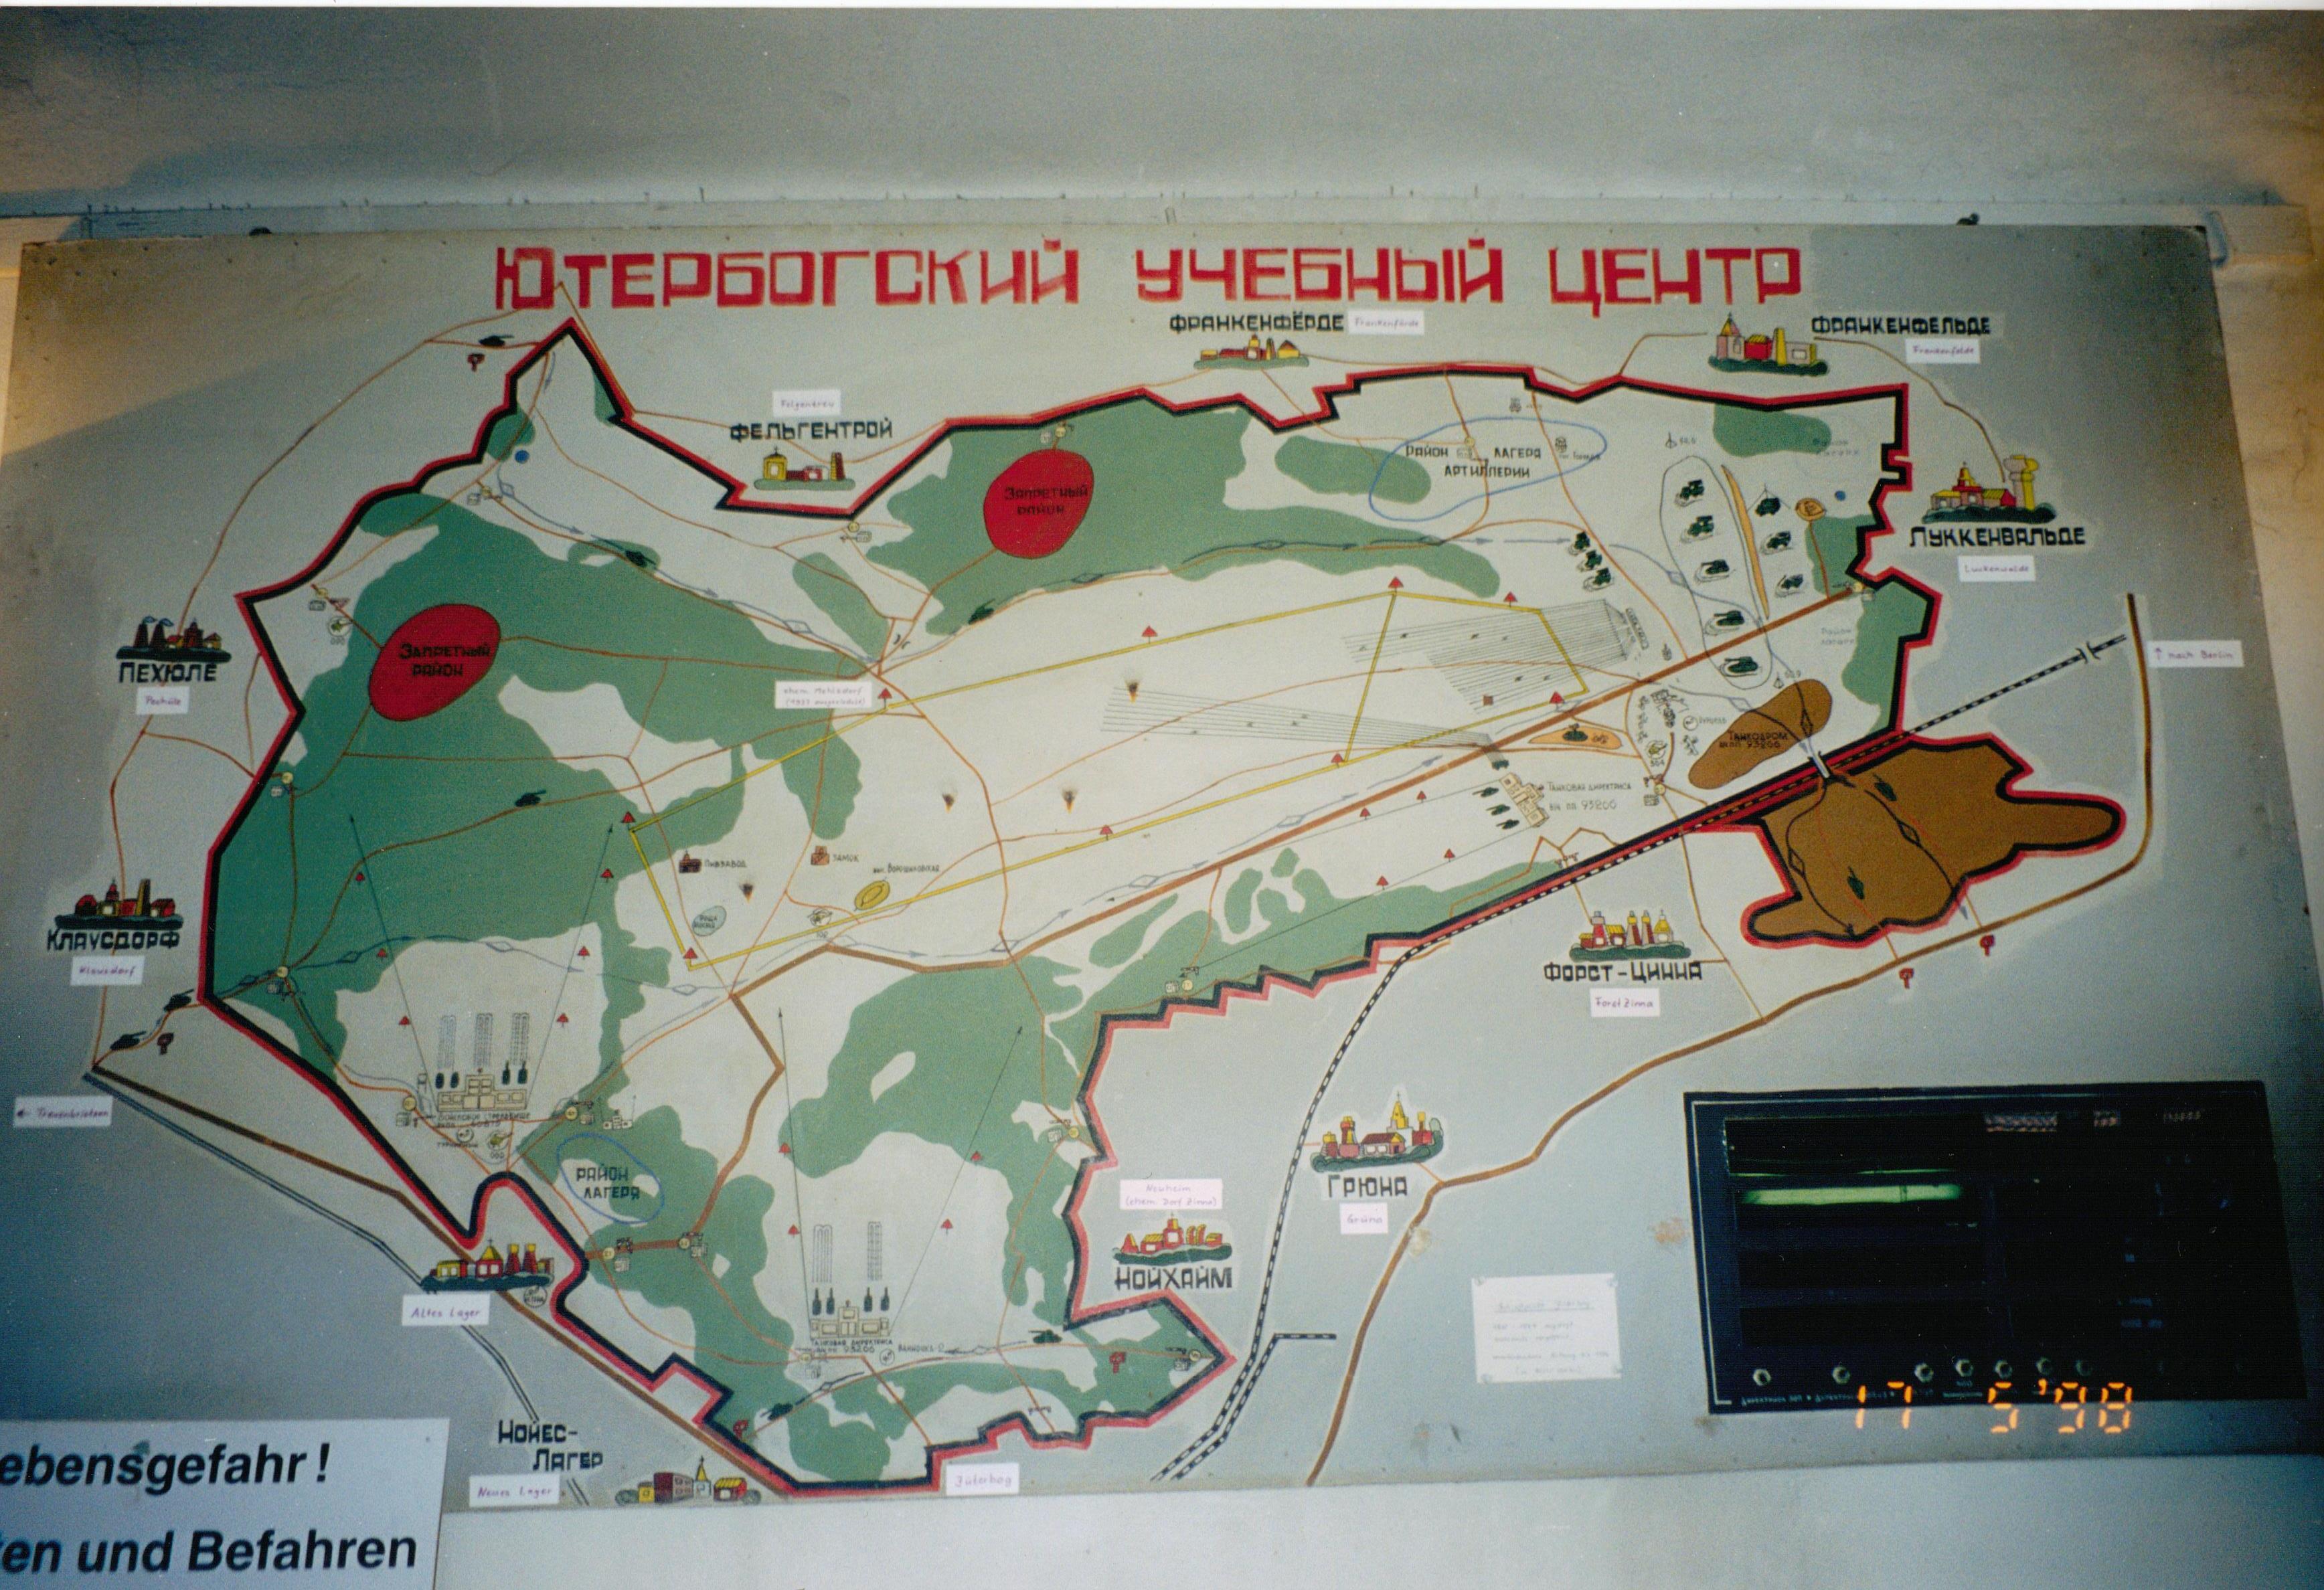 http://sh.uploads.ru/fpSBM.jpg